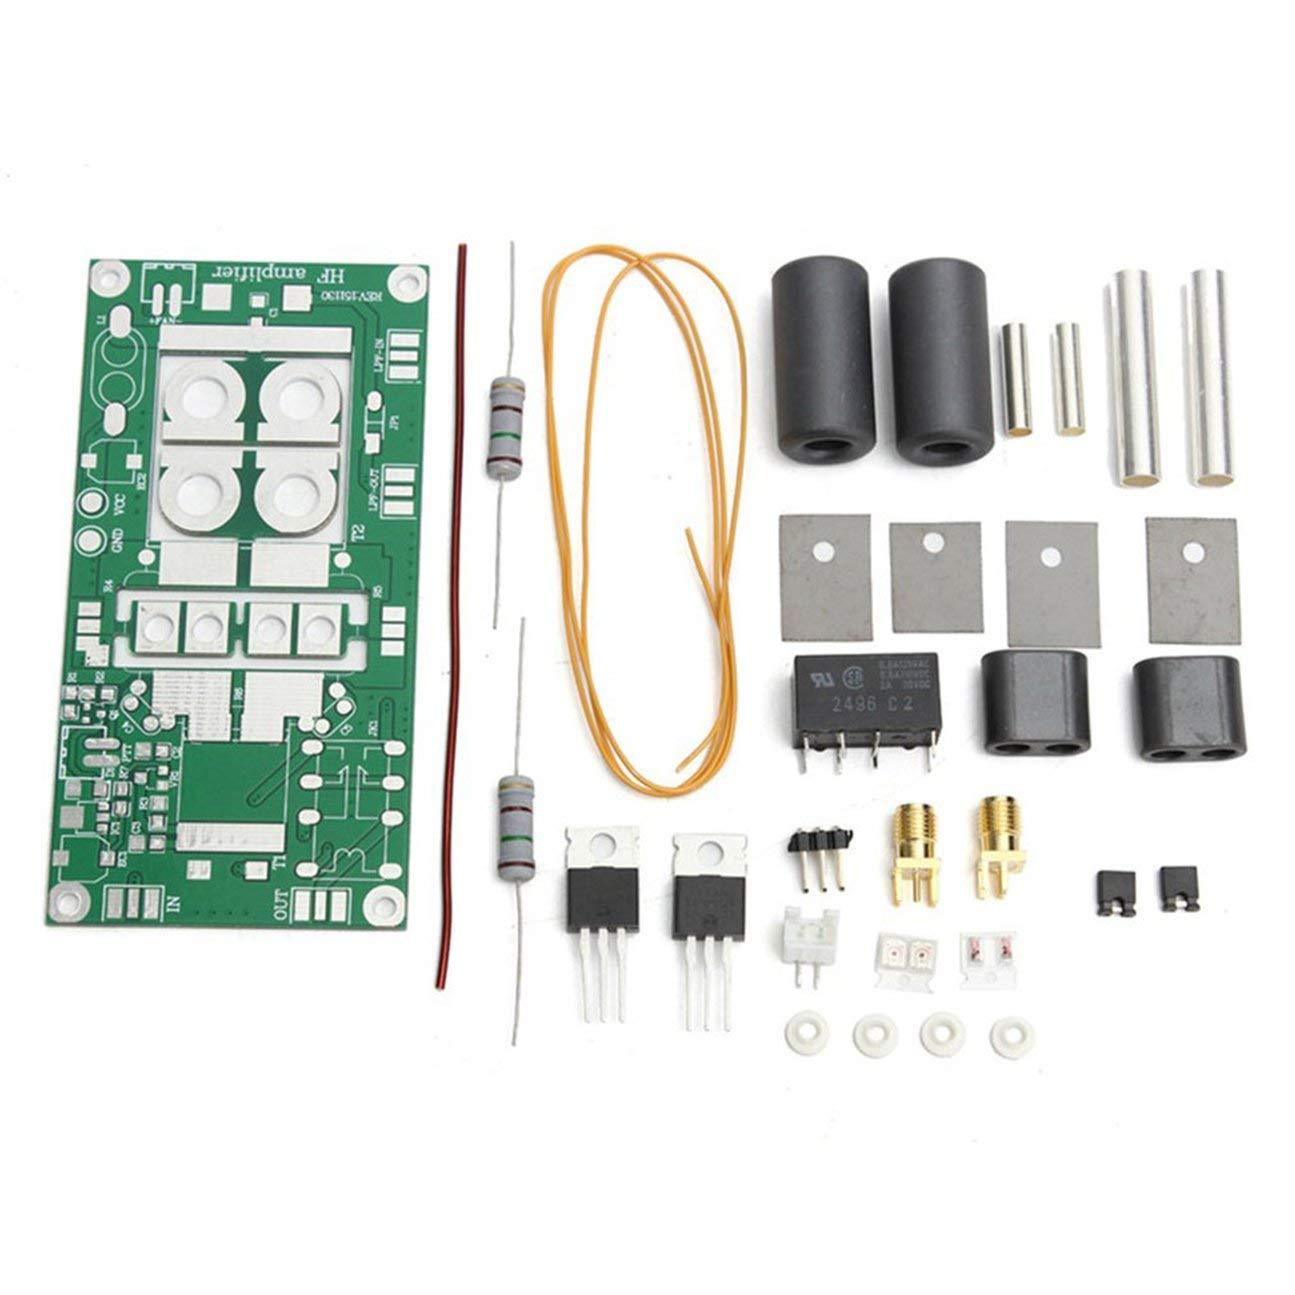 MachinYeser Amplificador de Potencia HF Lineal de 70W SSB ...